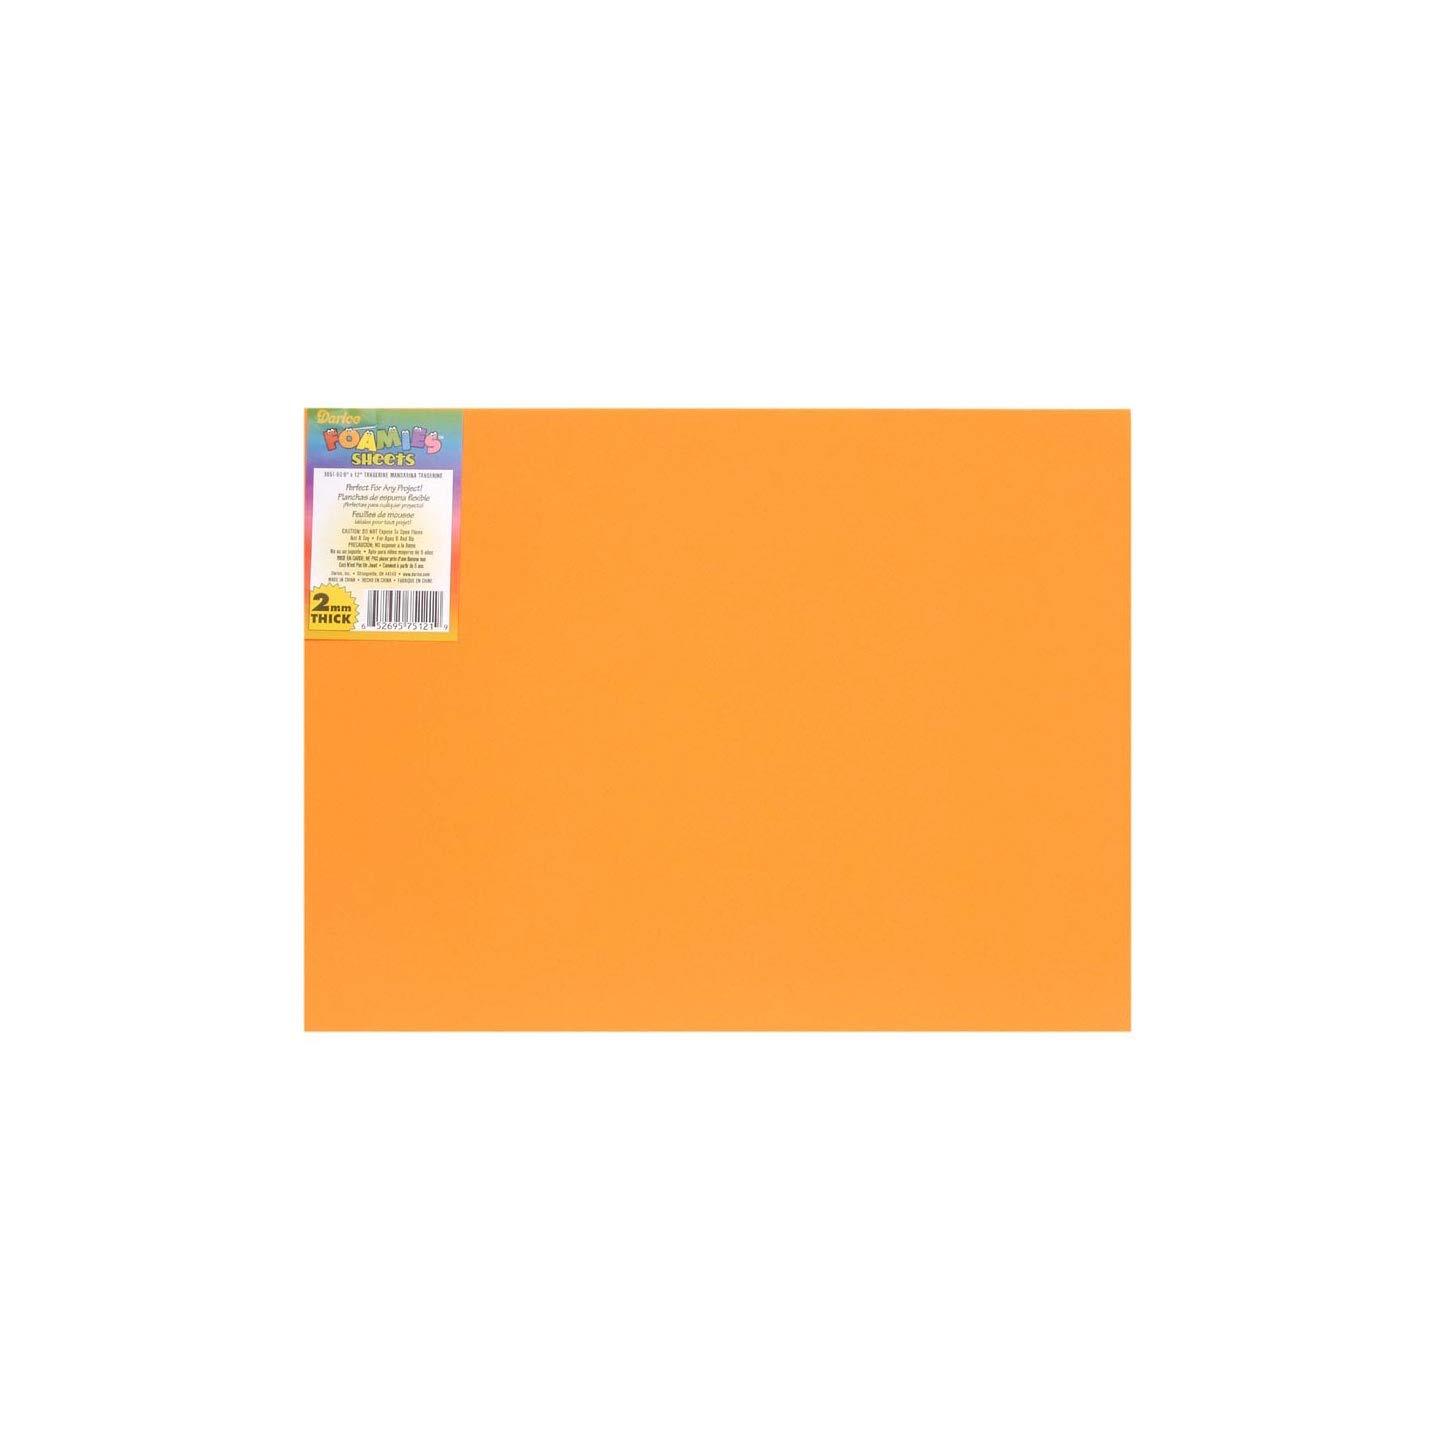 FOAMIES 1144-30 Sheet, 2mm/30cm X 45cm, Black Darice